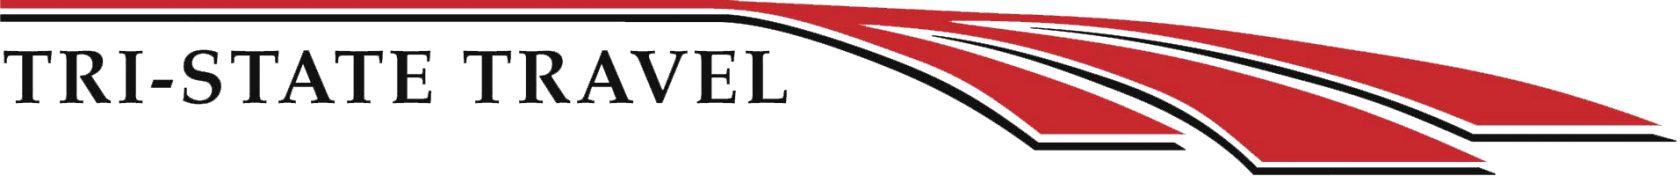 Tri-State Travel_Logo